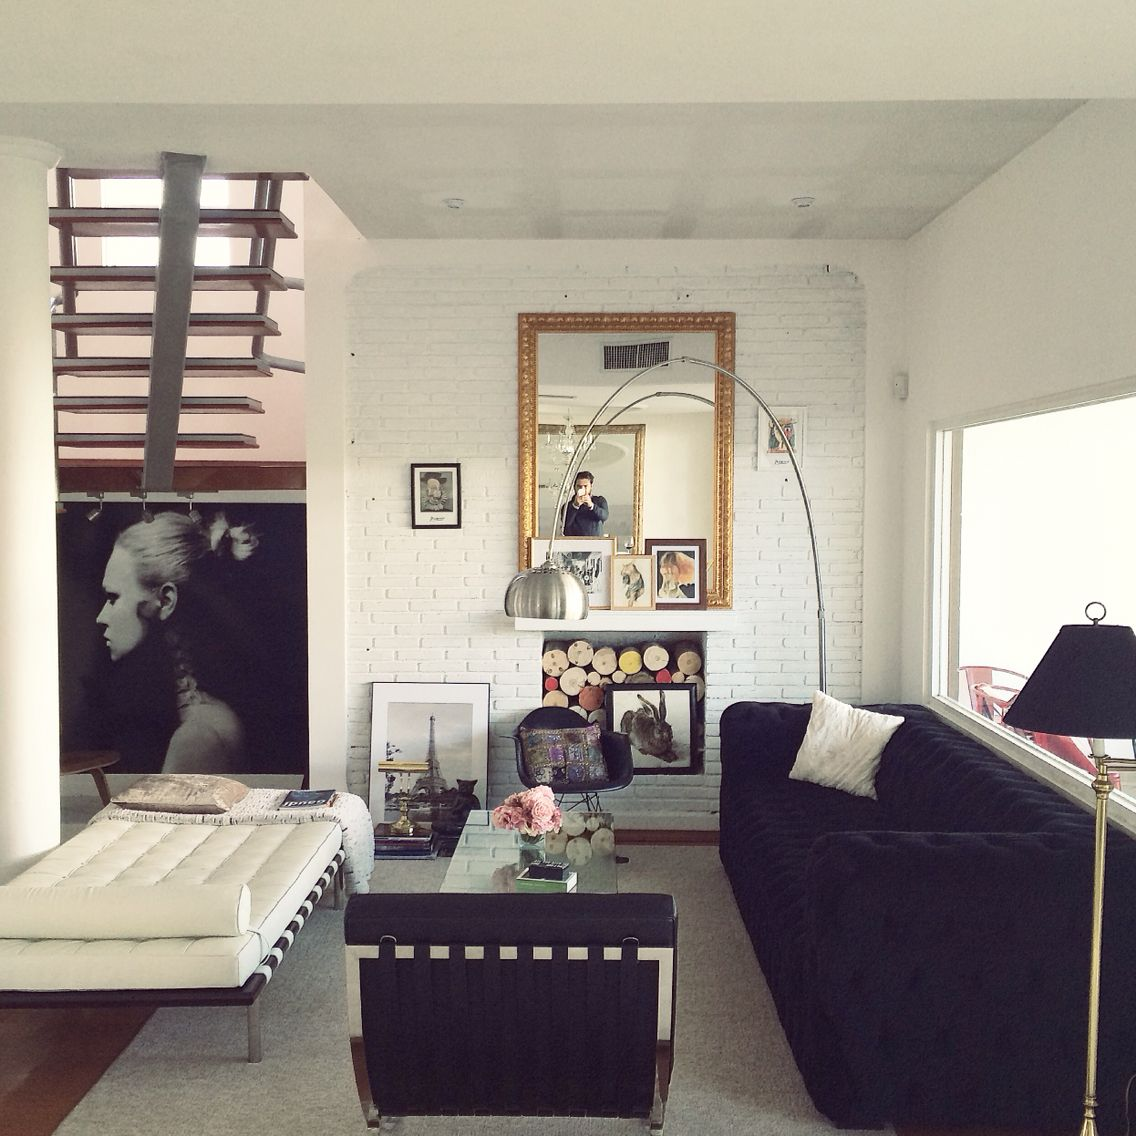 Modern vintage decor living room barcelona chair barcelona daybed modern capitone sofa eames for Barcelona chair living room ideas